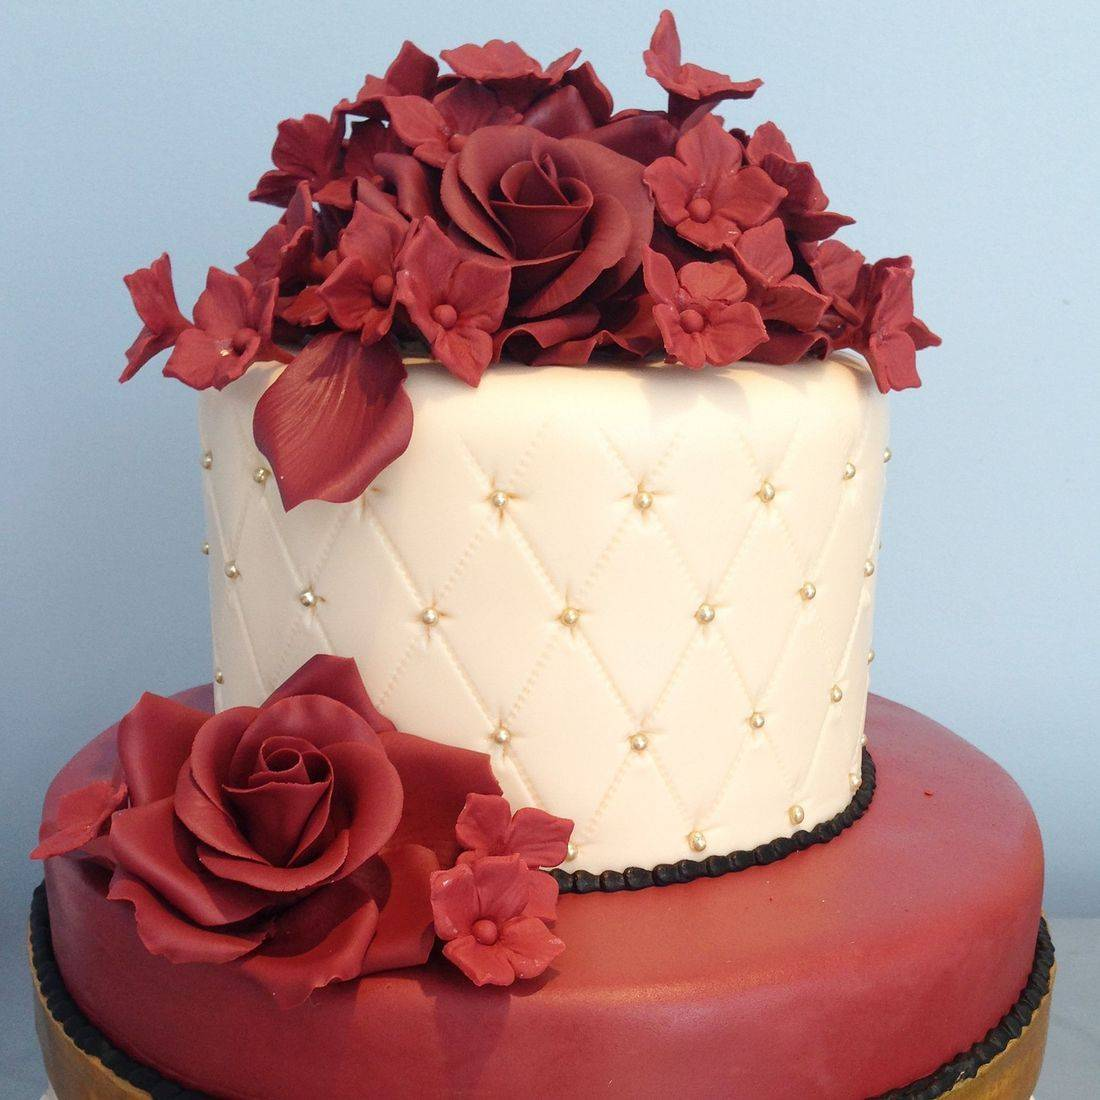 Custom Burgundy Rose Cheetah Print Tufted Cake  Milwaukee